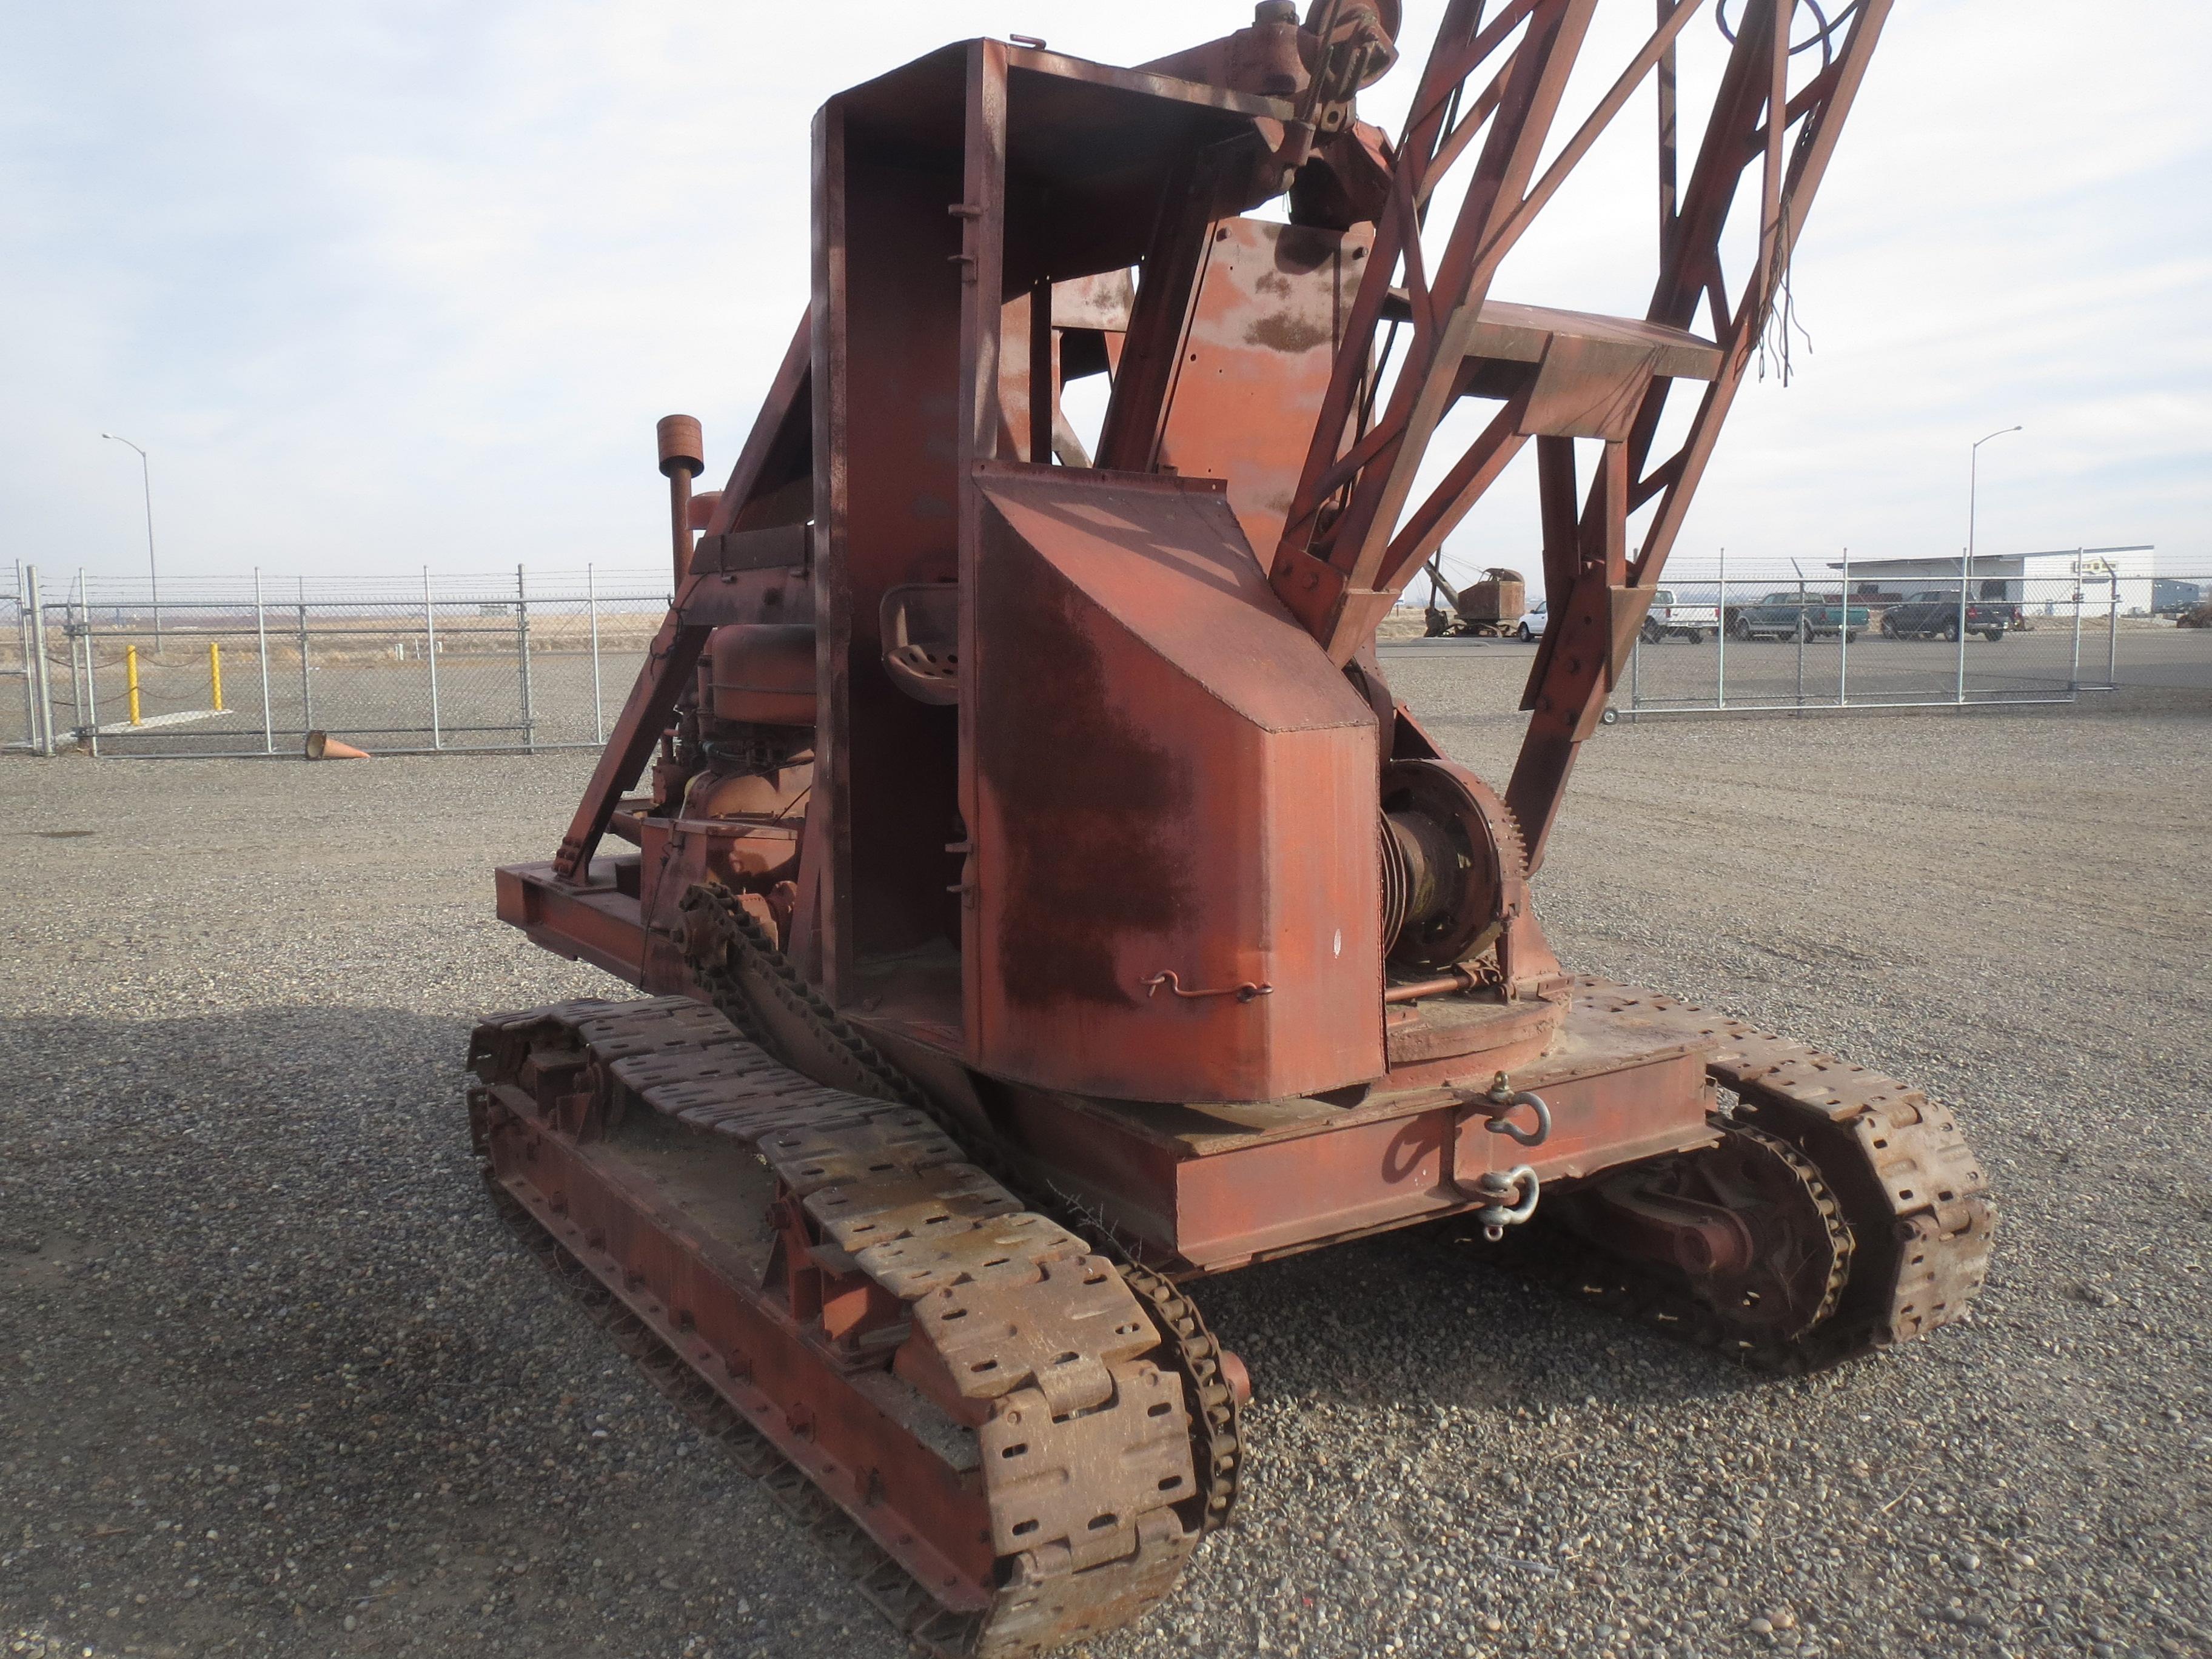 WHECO Richland: Antique Crane